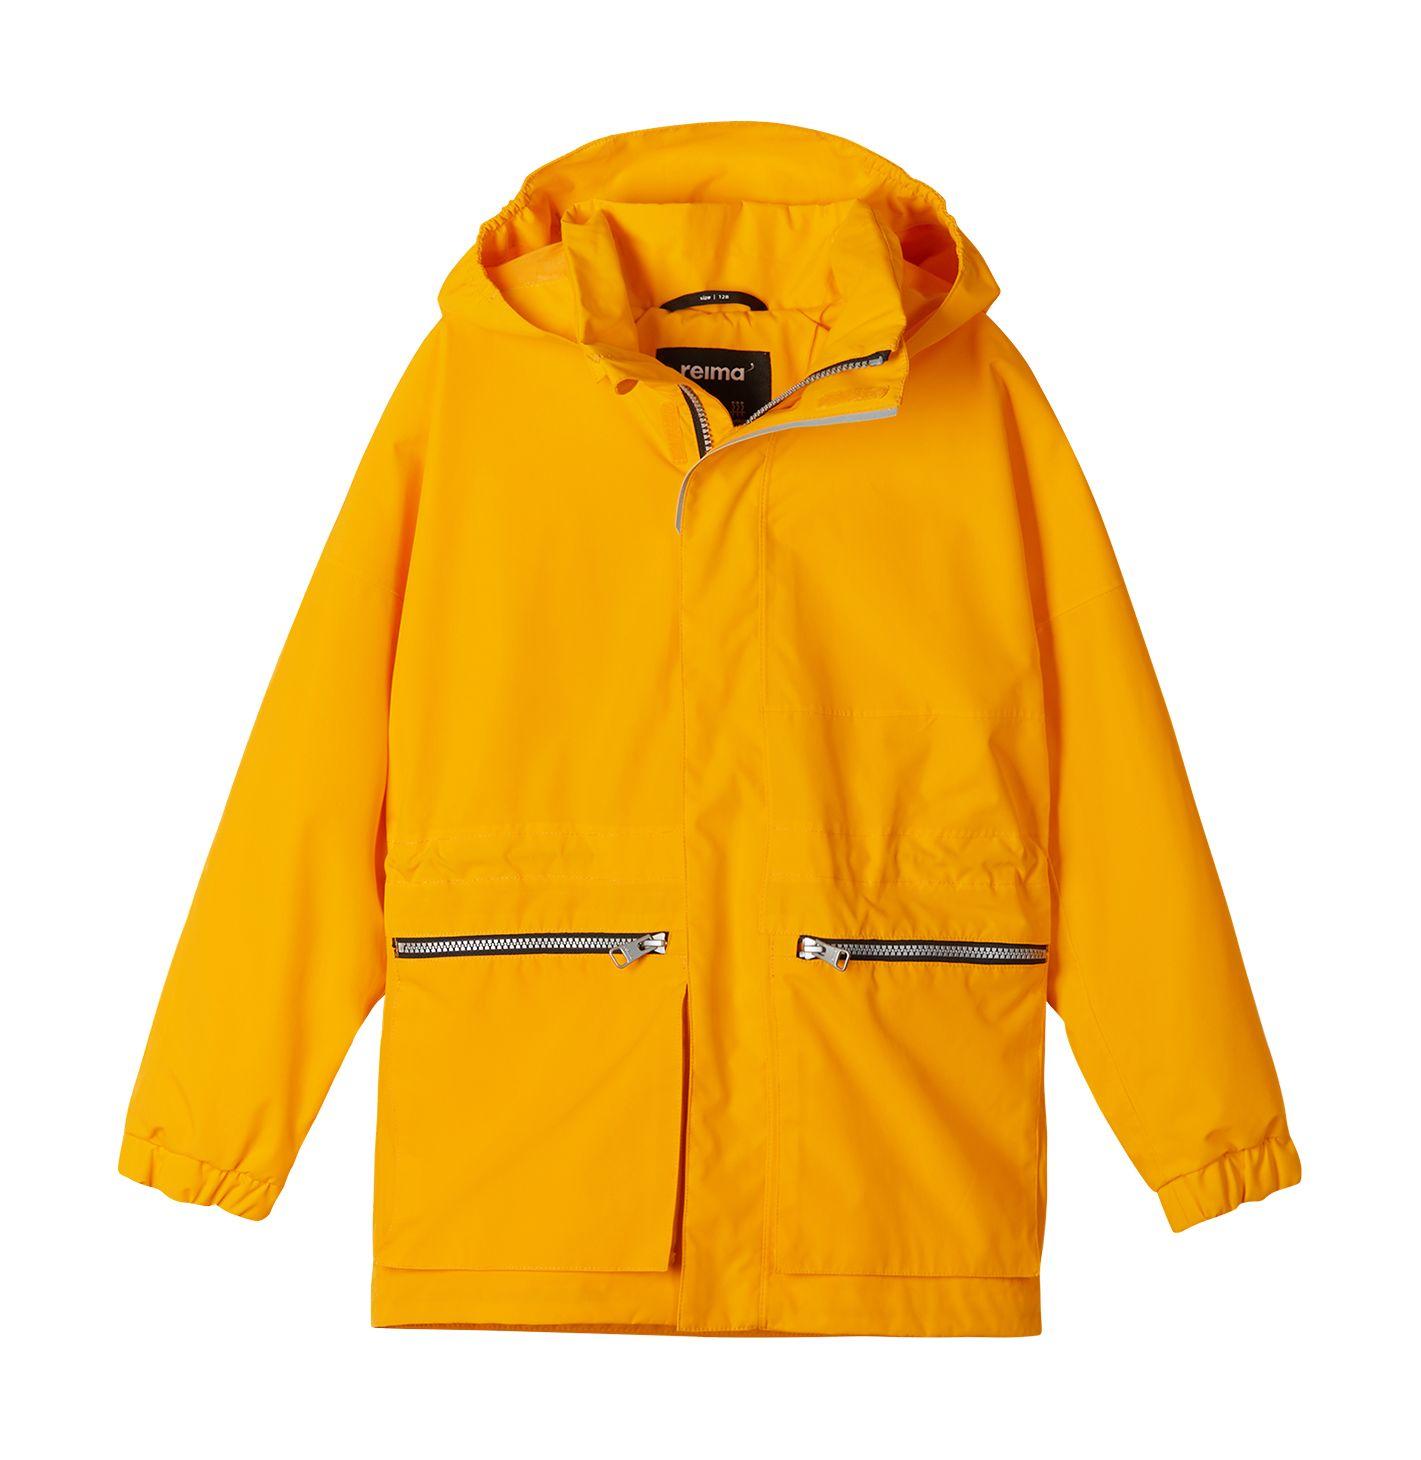 REIMA Kempele Orange Yellow 128